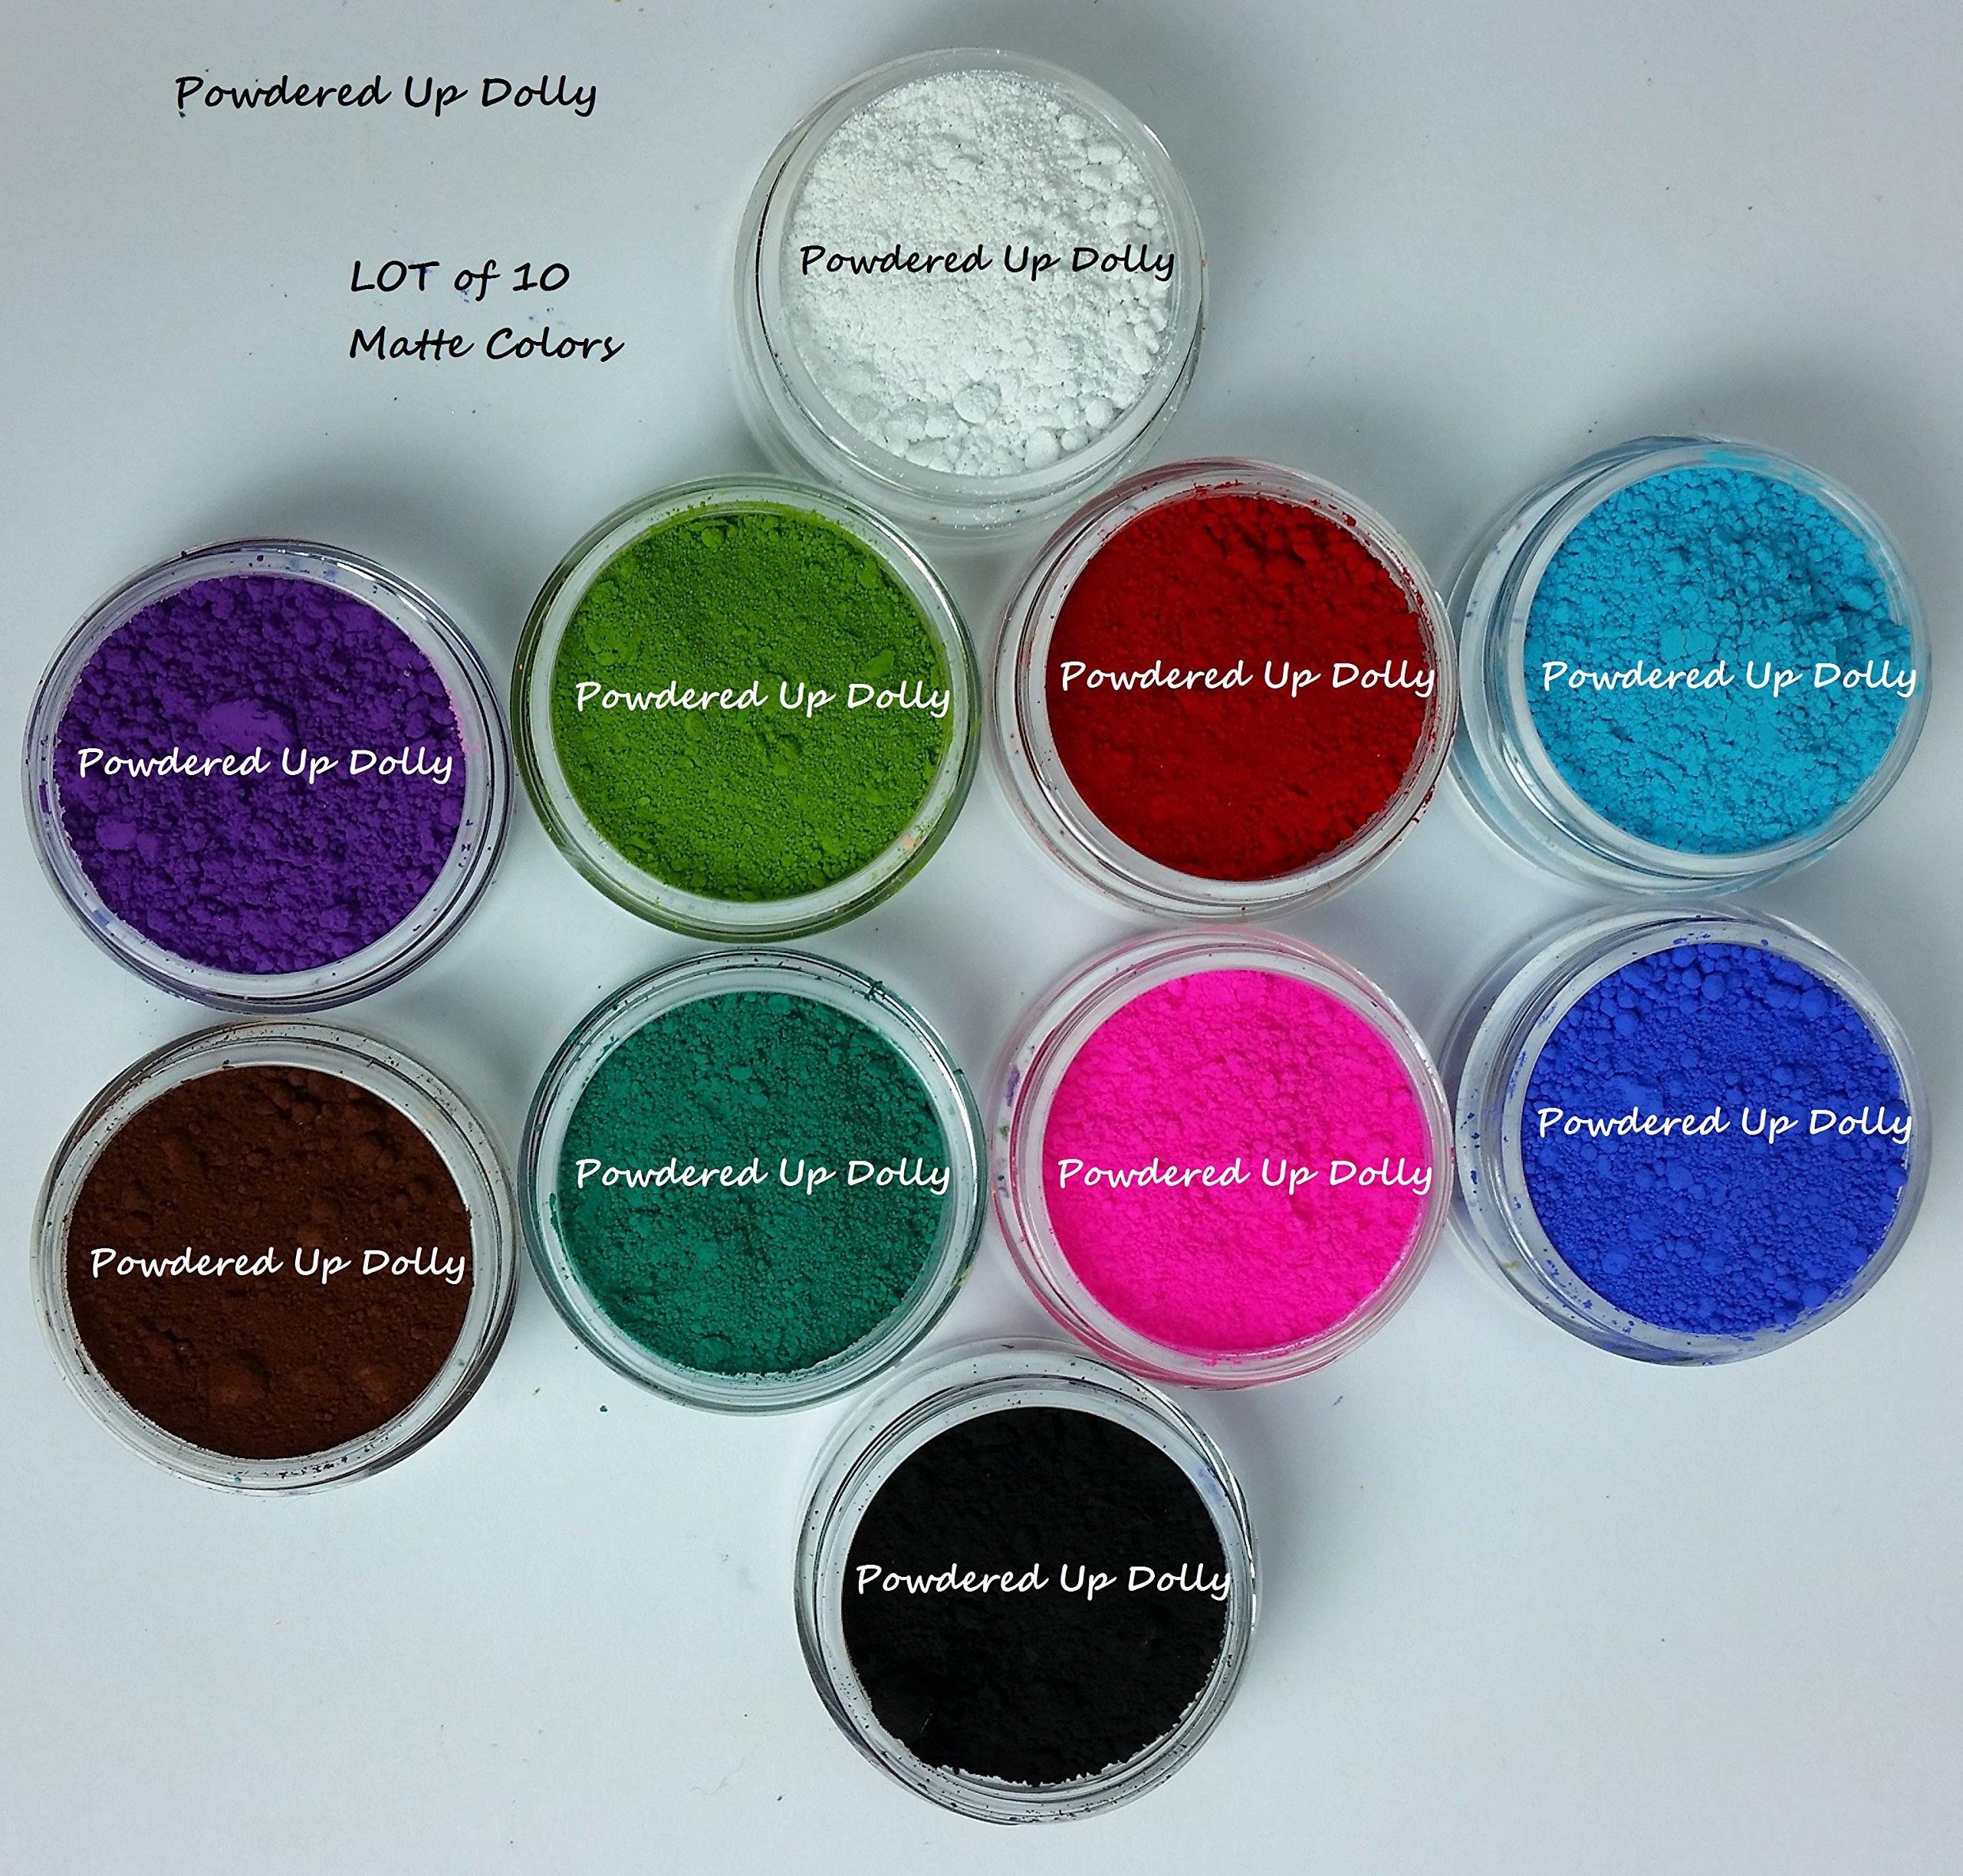 100g Grams Lot of 10 JARS 10g EACH By Volume Cp Mp Hp DIY Natural Soap Pigment Powders WHITE Purple GREEN Red BLUE Black Teal Ultramarine Neon Bath Bomb Cosmetic Jar 100g in JARS